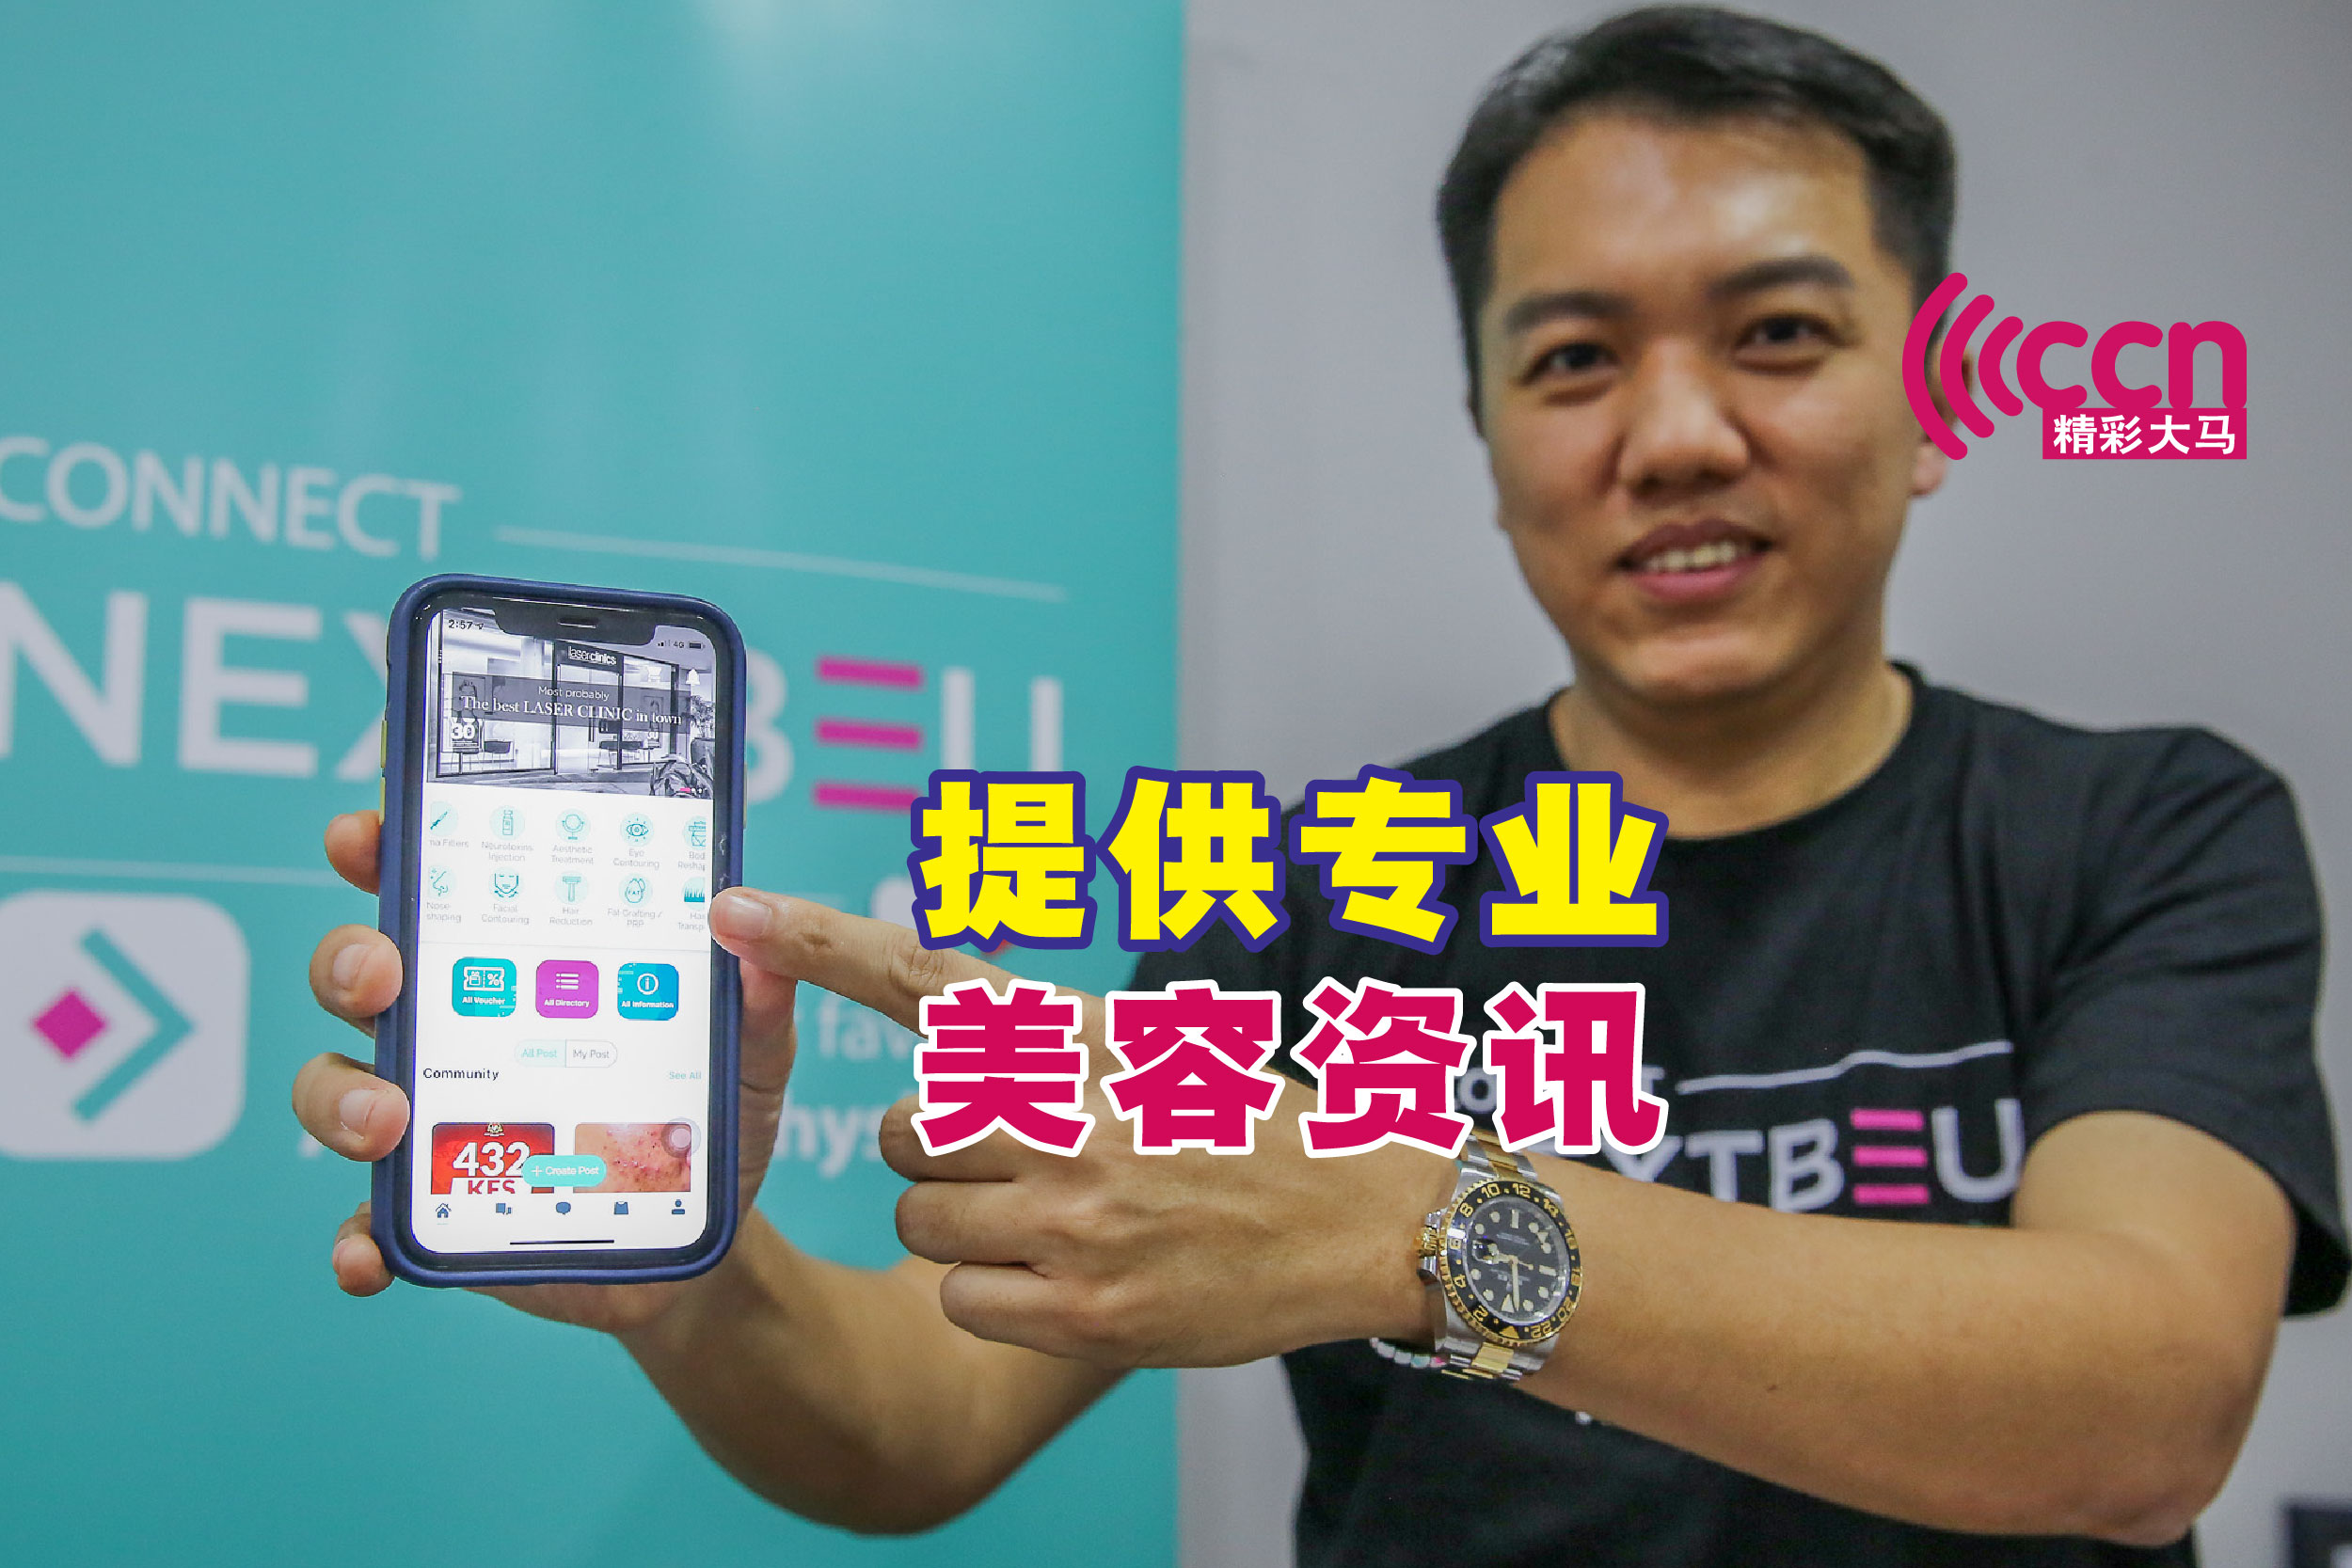 NextBeu手机应用程序能提供专业的美容知识和资讯。-Yusof Mat Isa摄/精彩大马制图/